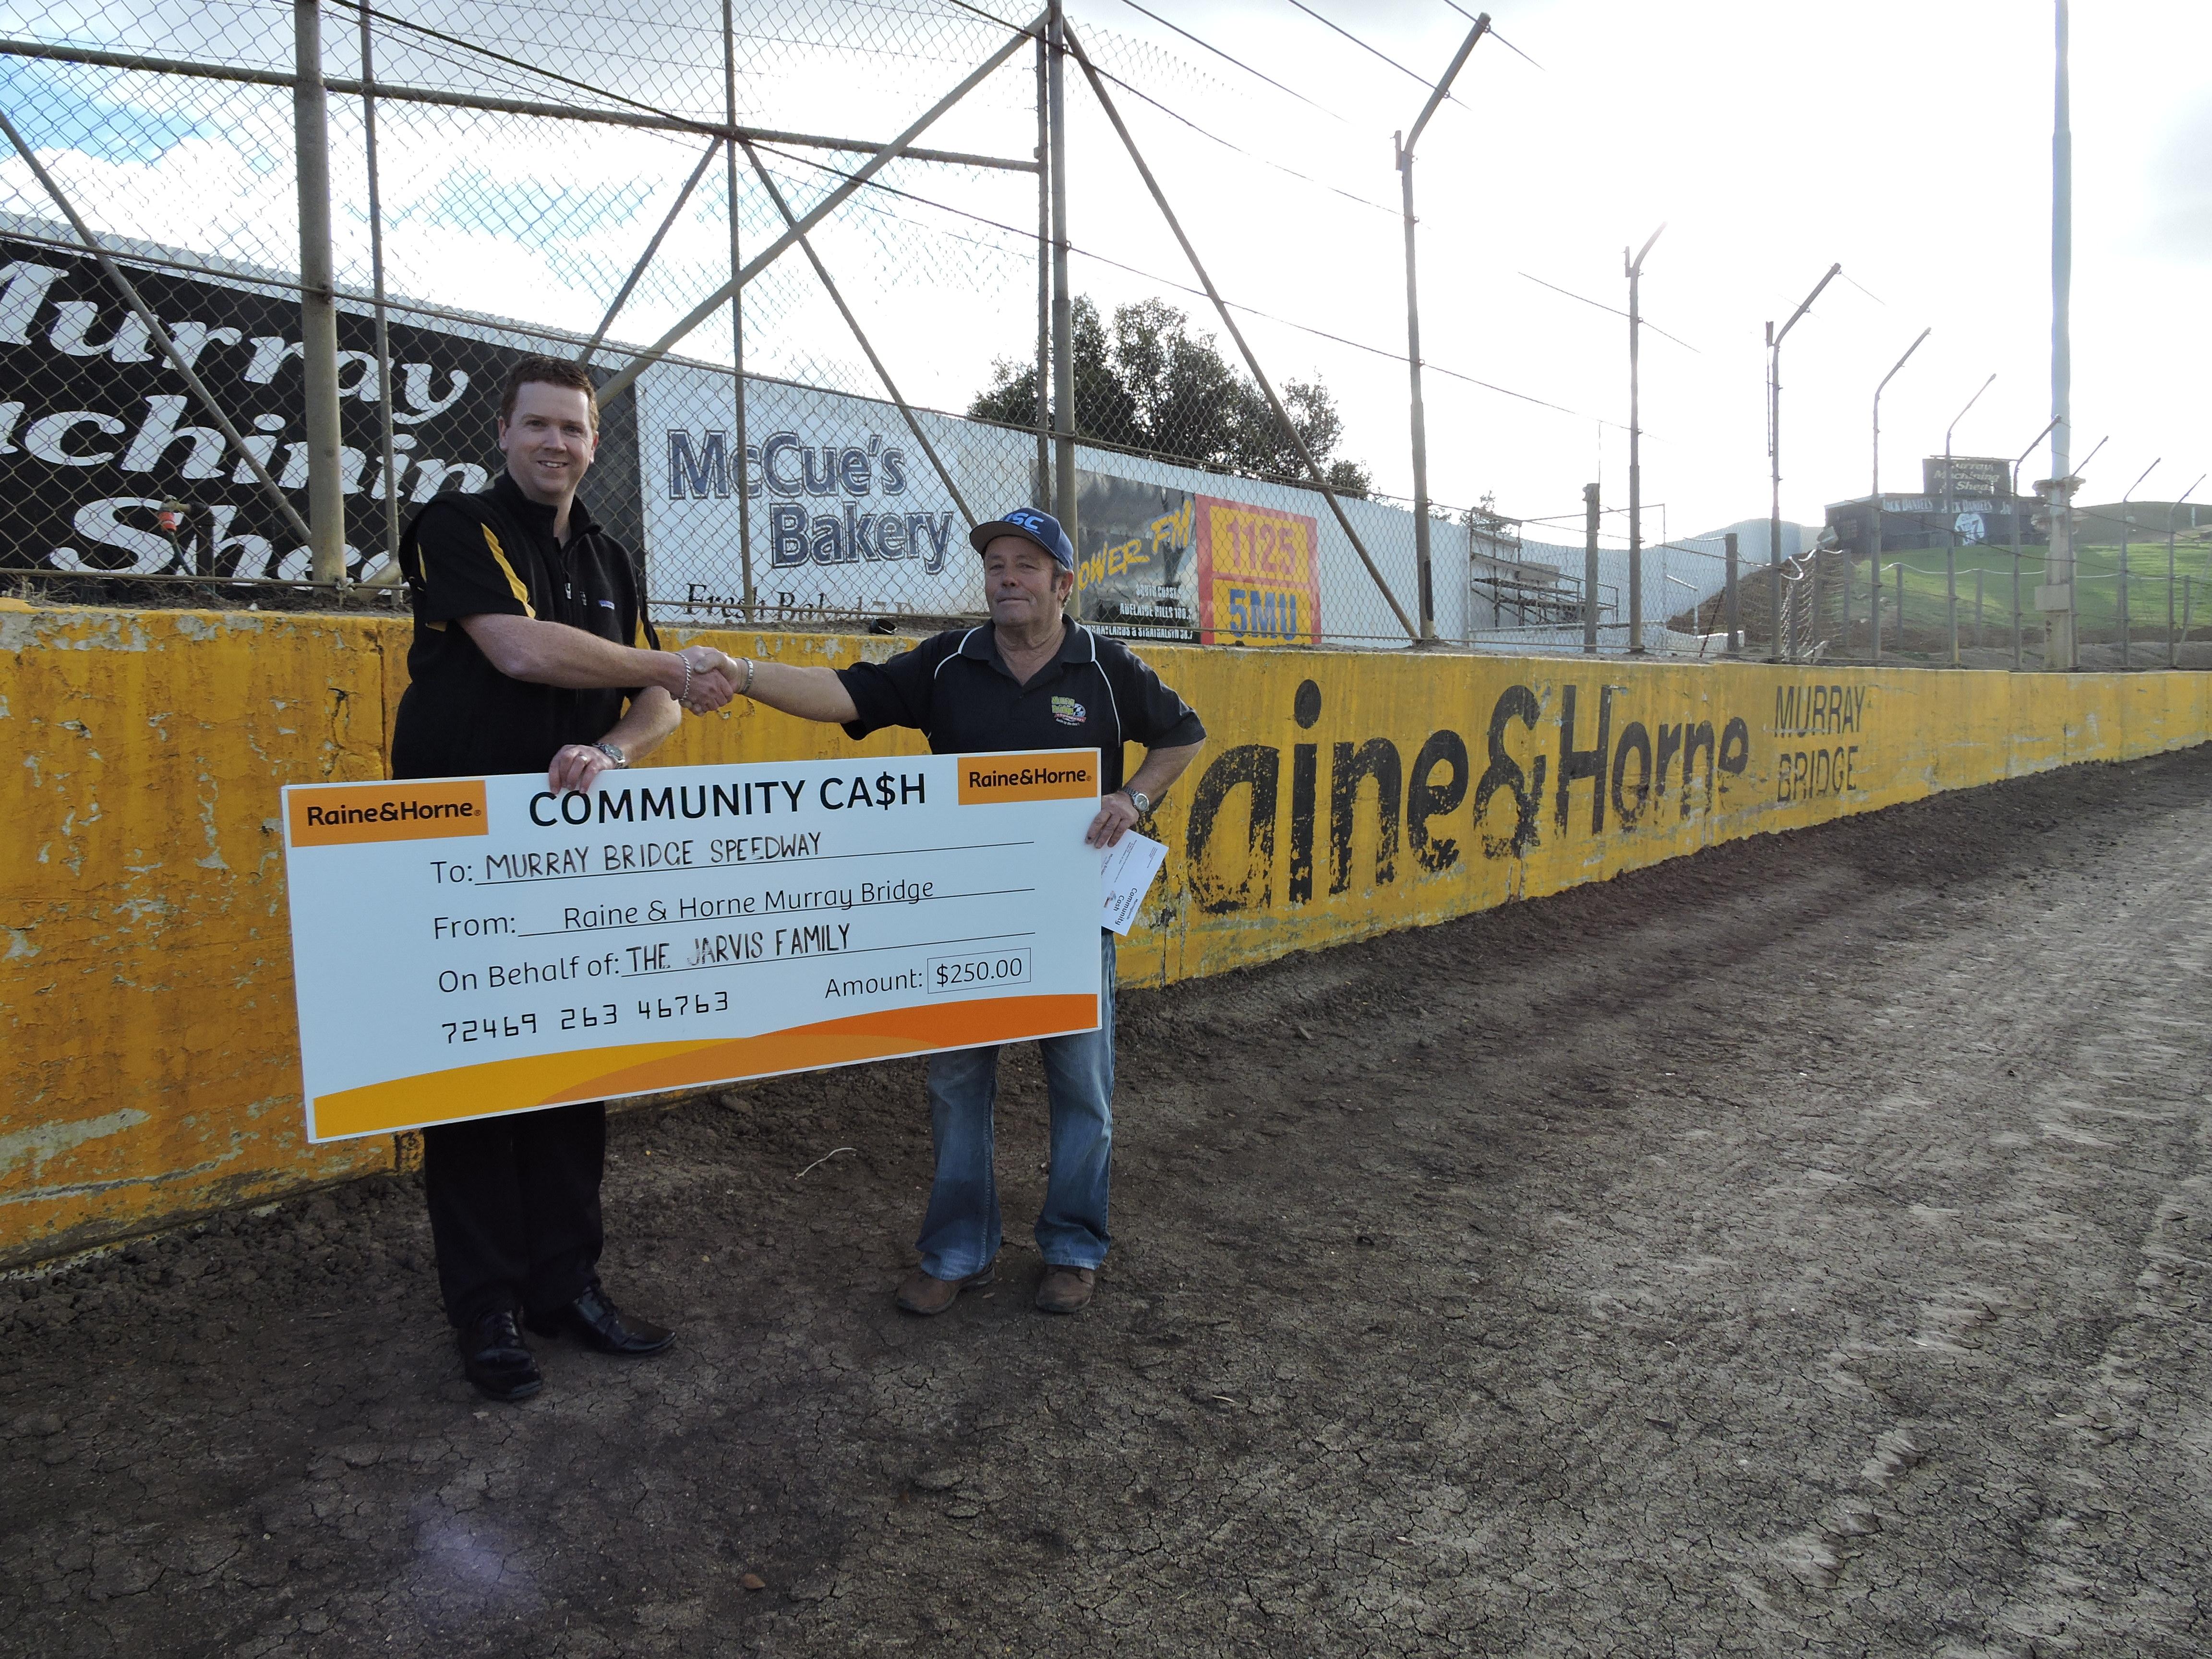 Community Cash - Murray Bridge Speedway